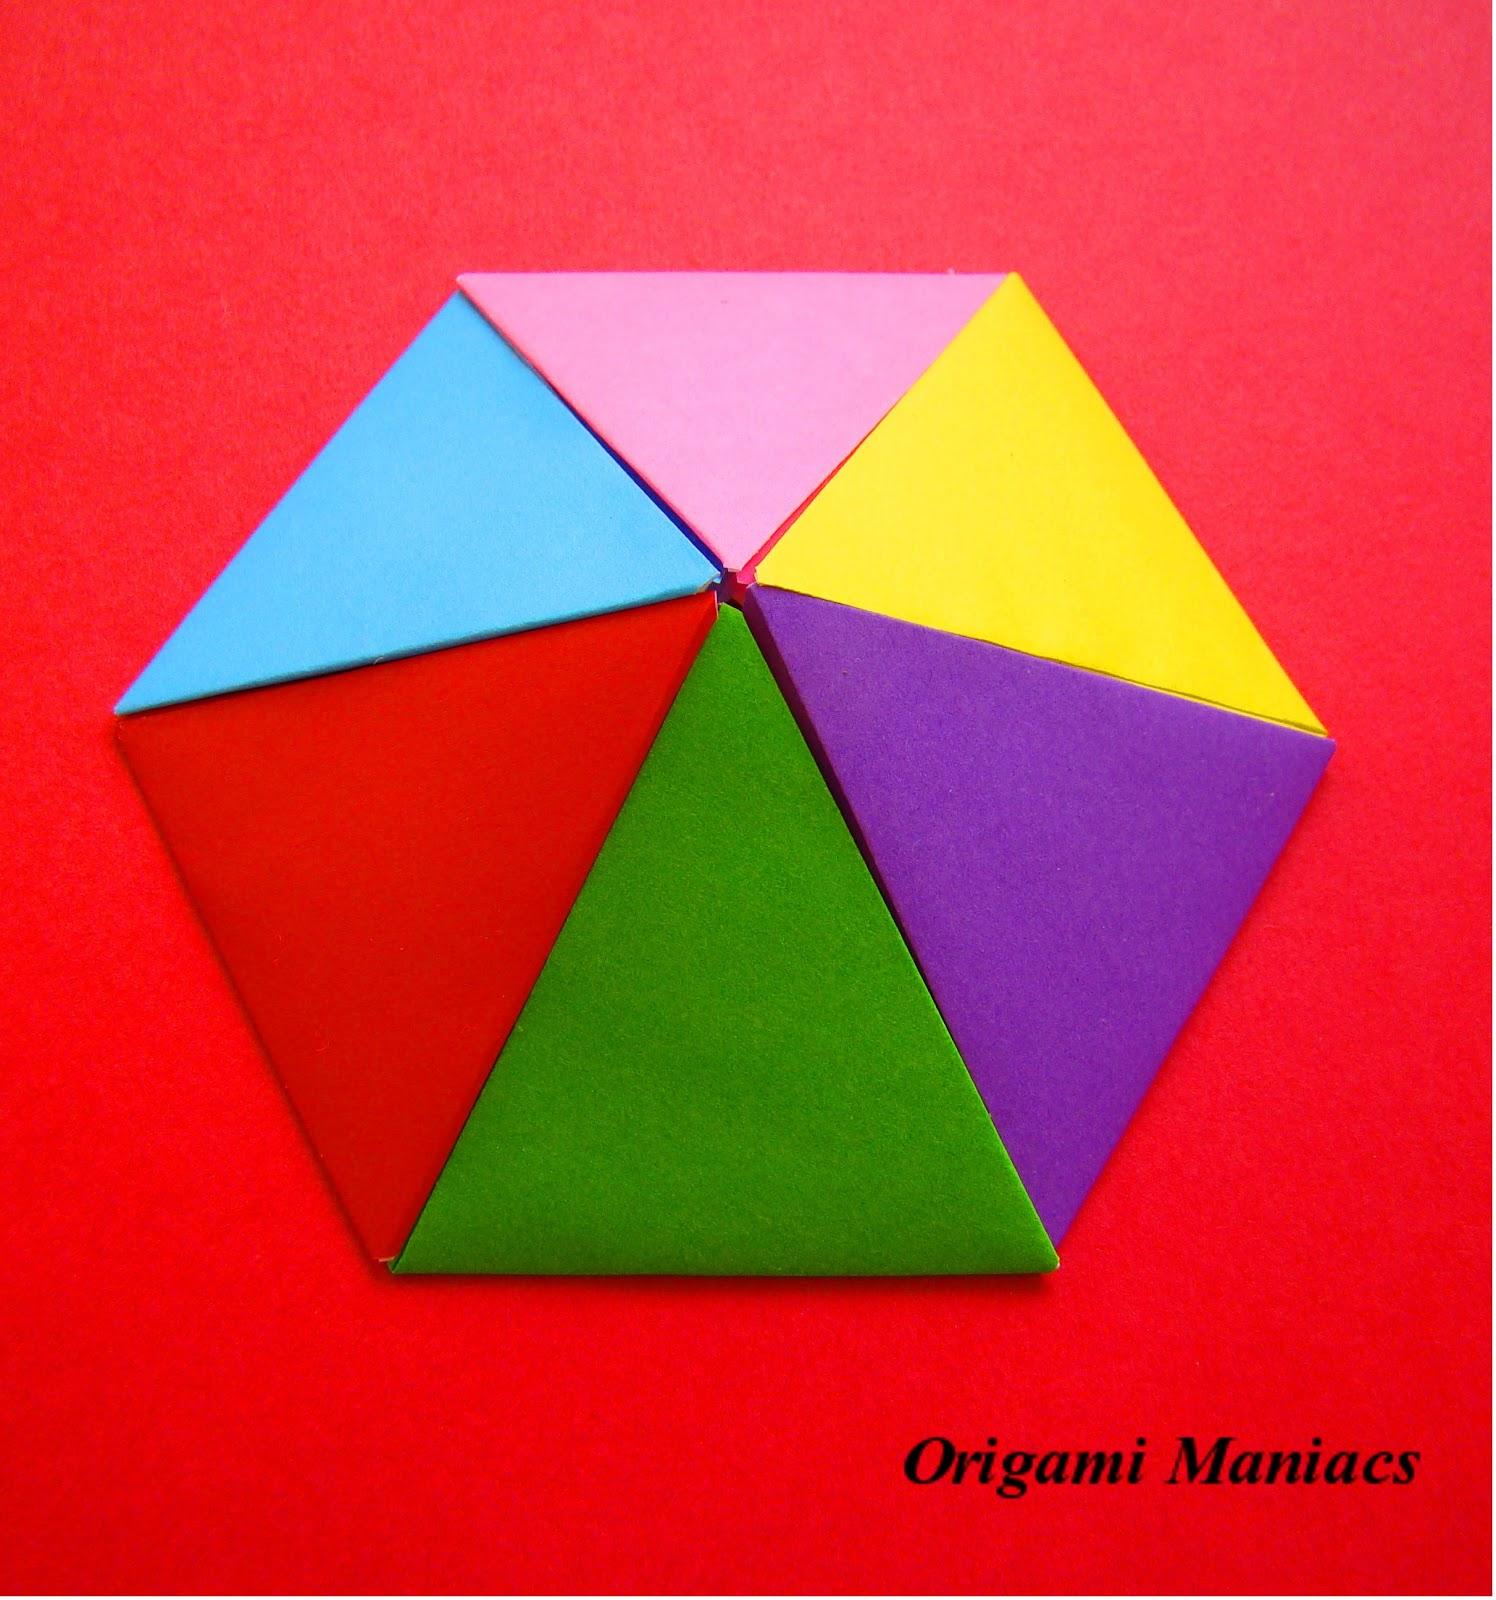 Origami Maniacs Pyramids